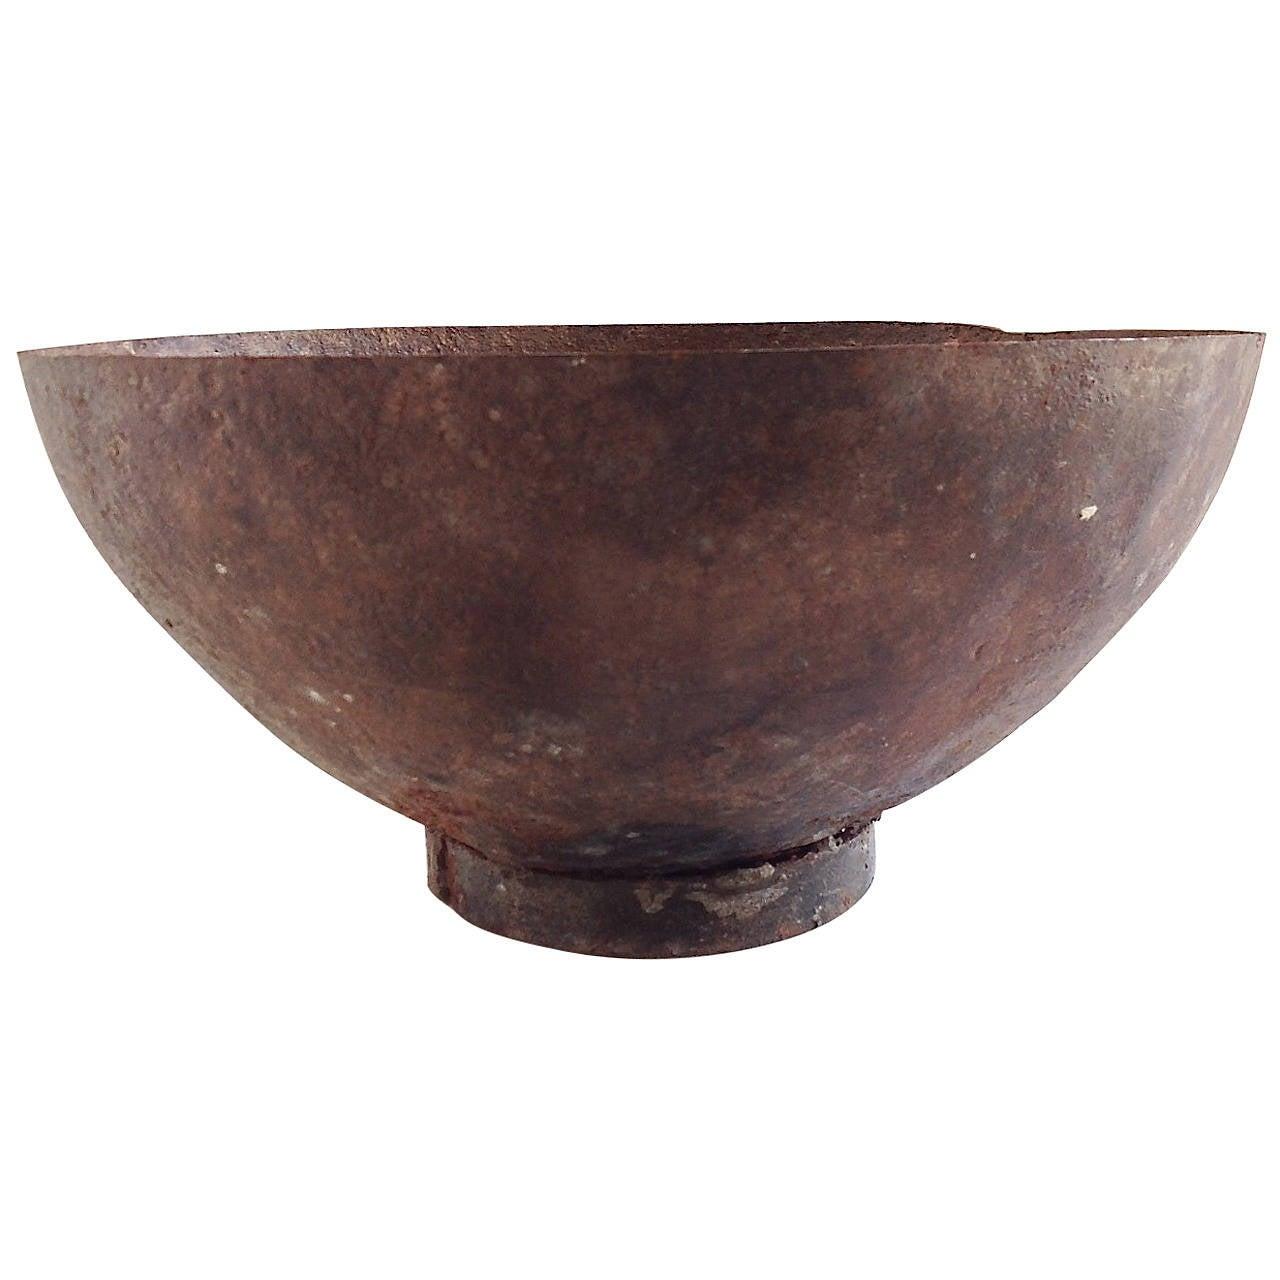 Large Iron Riveted Bowl At 1stdibs